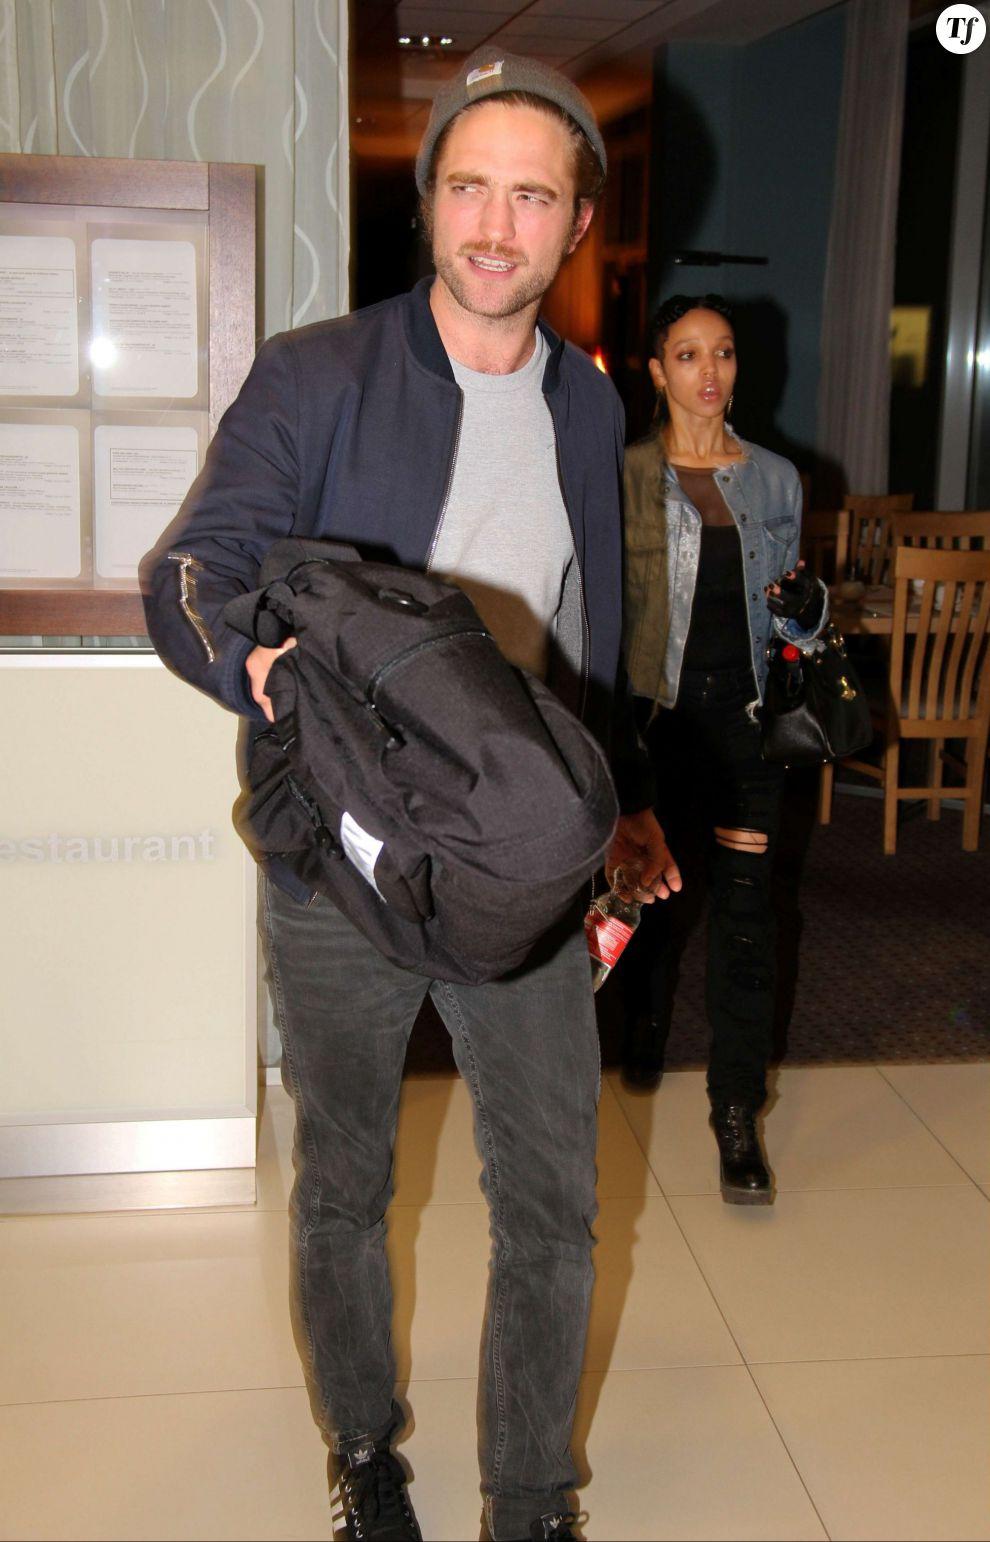 Robert Pattinson et sa future femme FKA Twigs